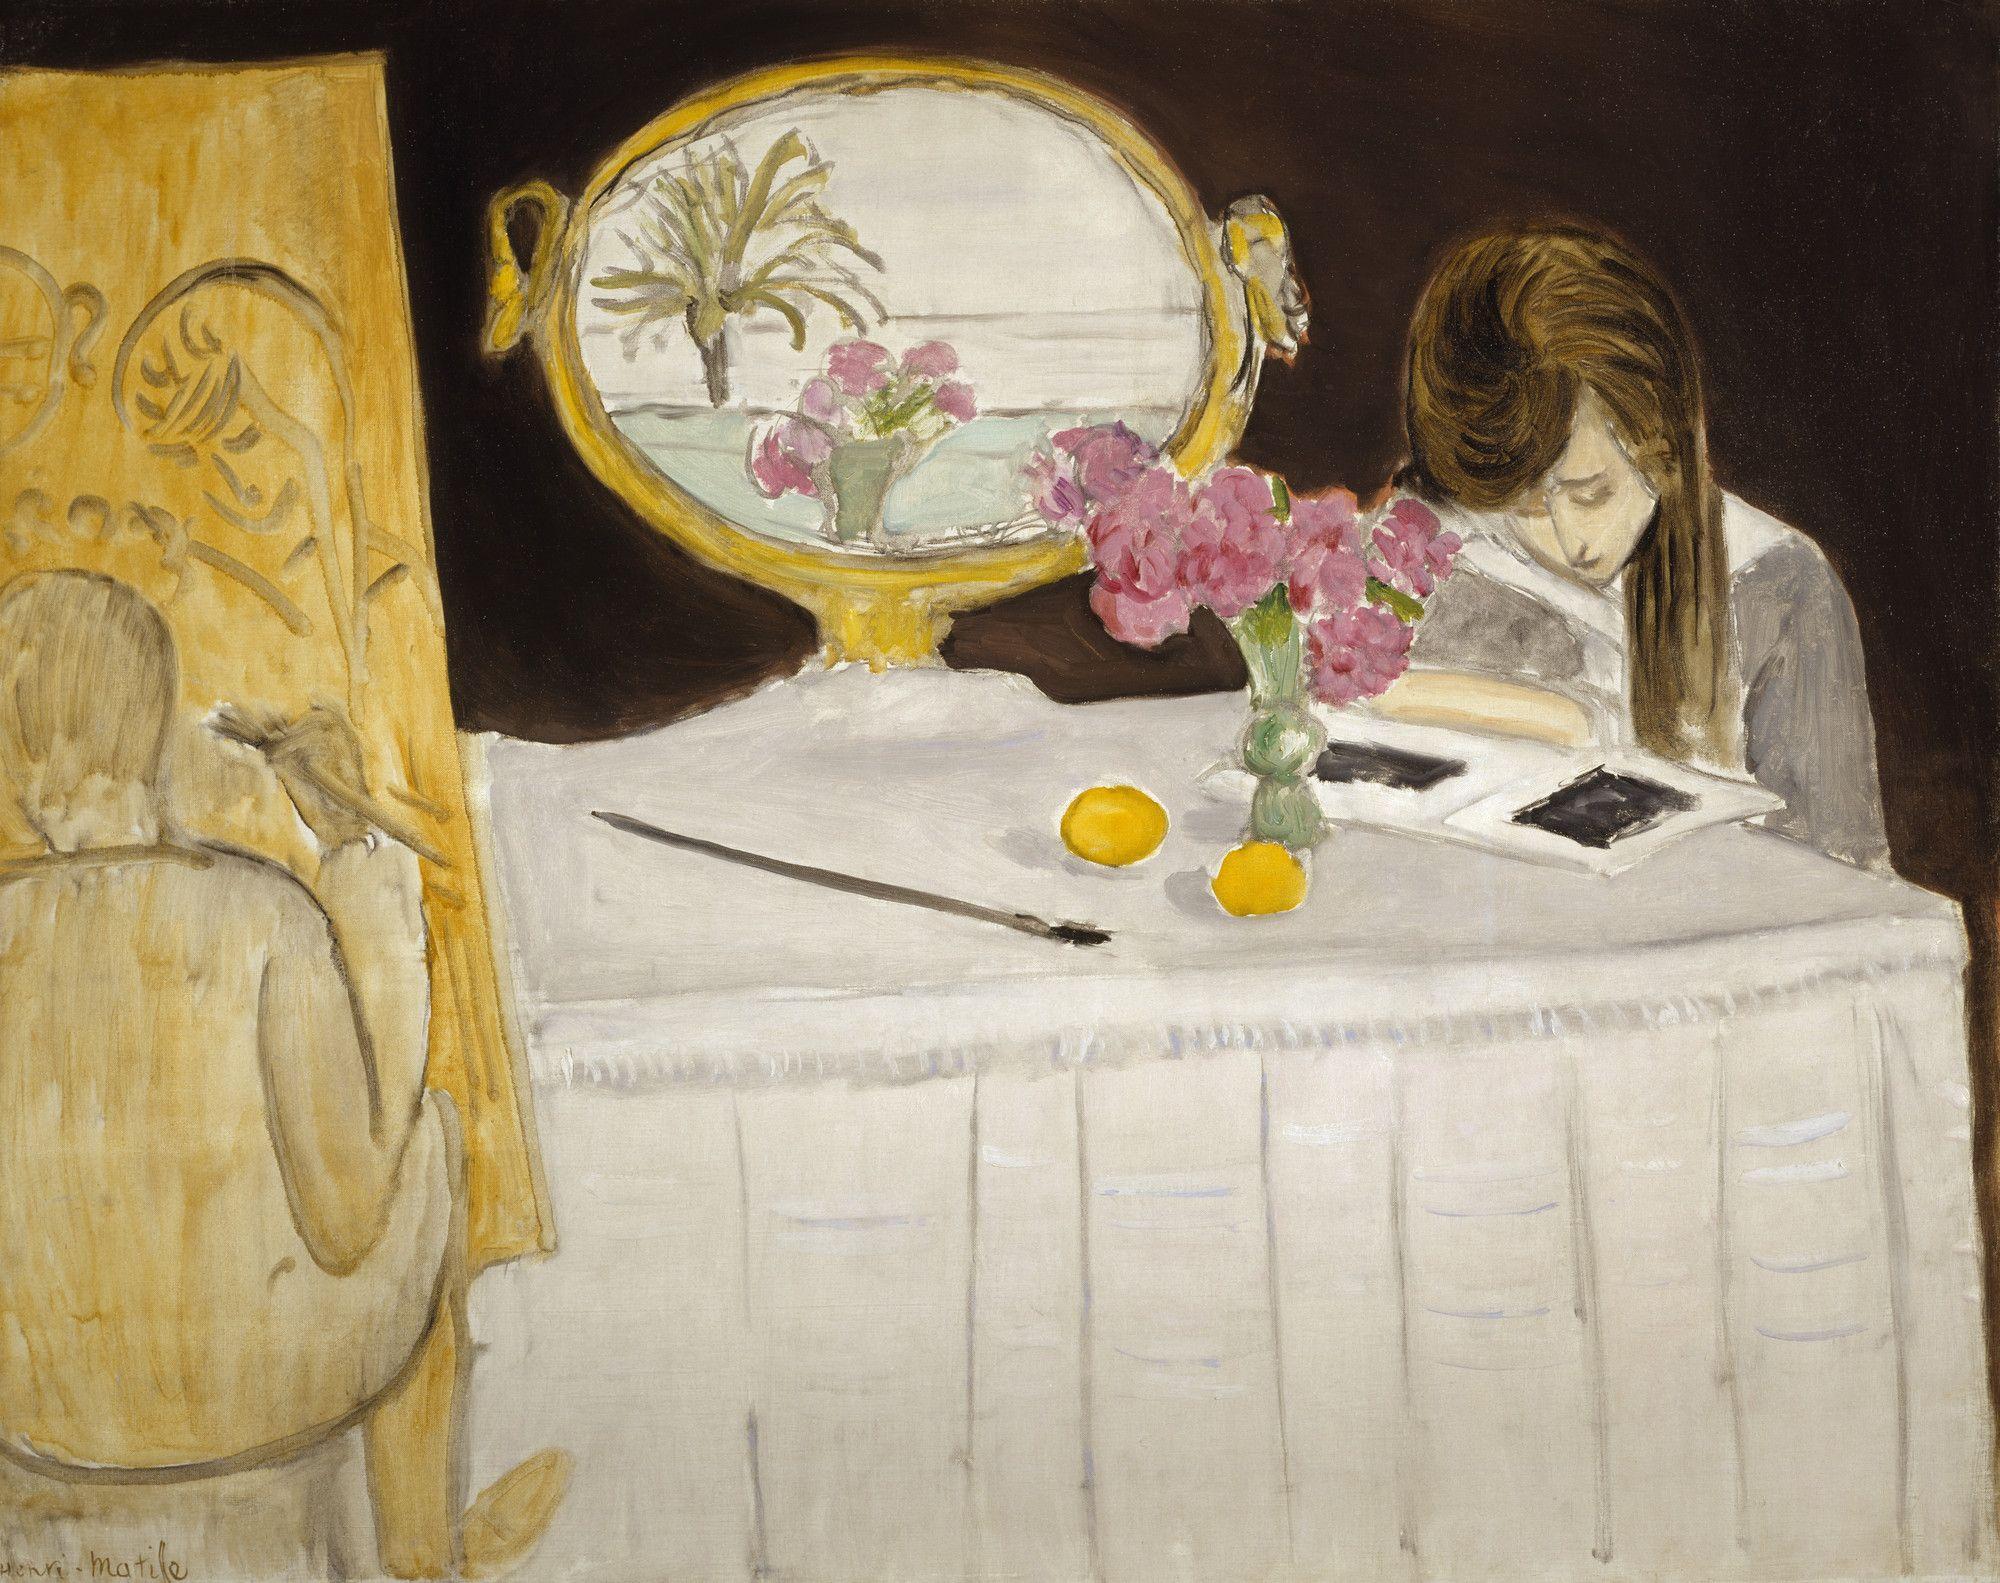 la lecon de peintur   Henri matisse, Matisse art, Painting